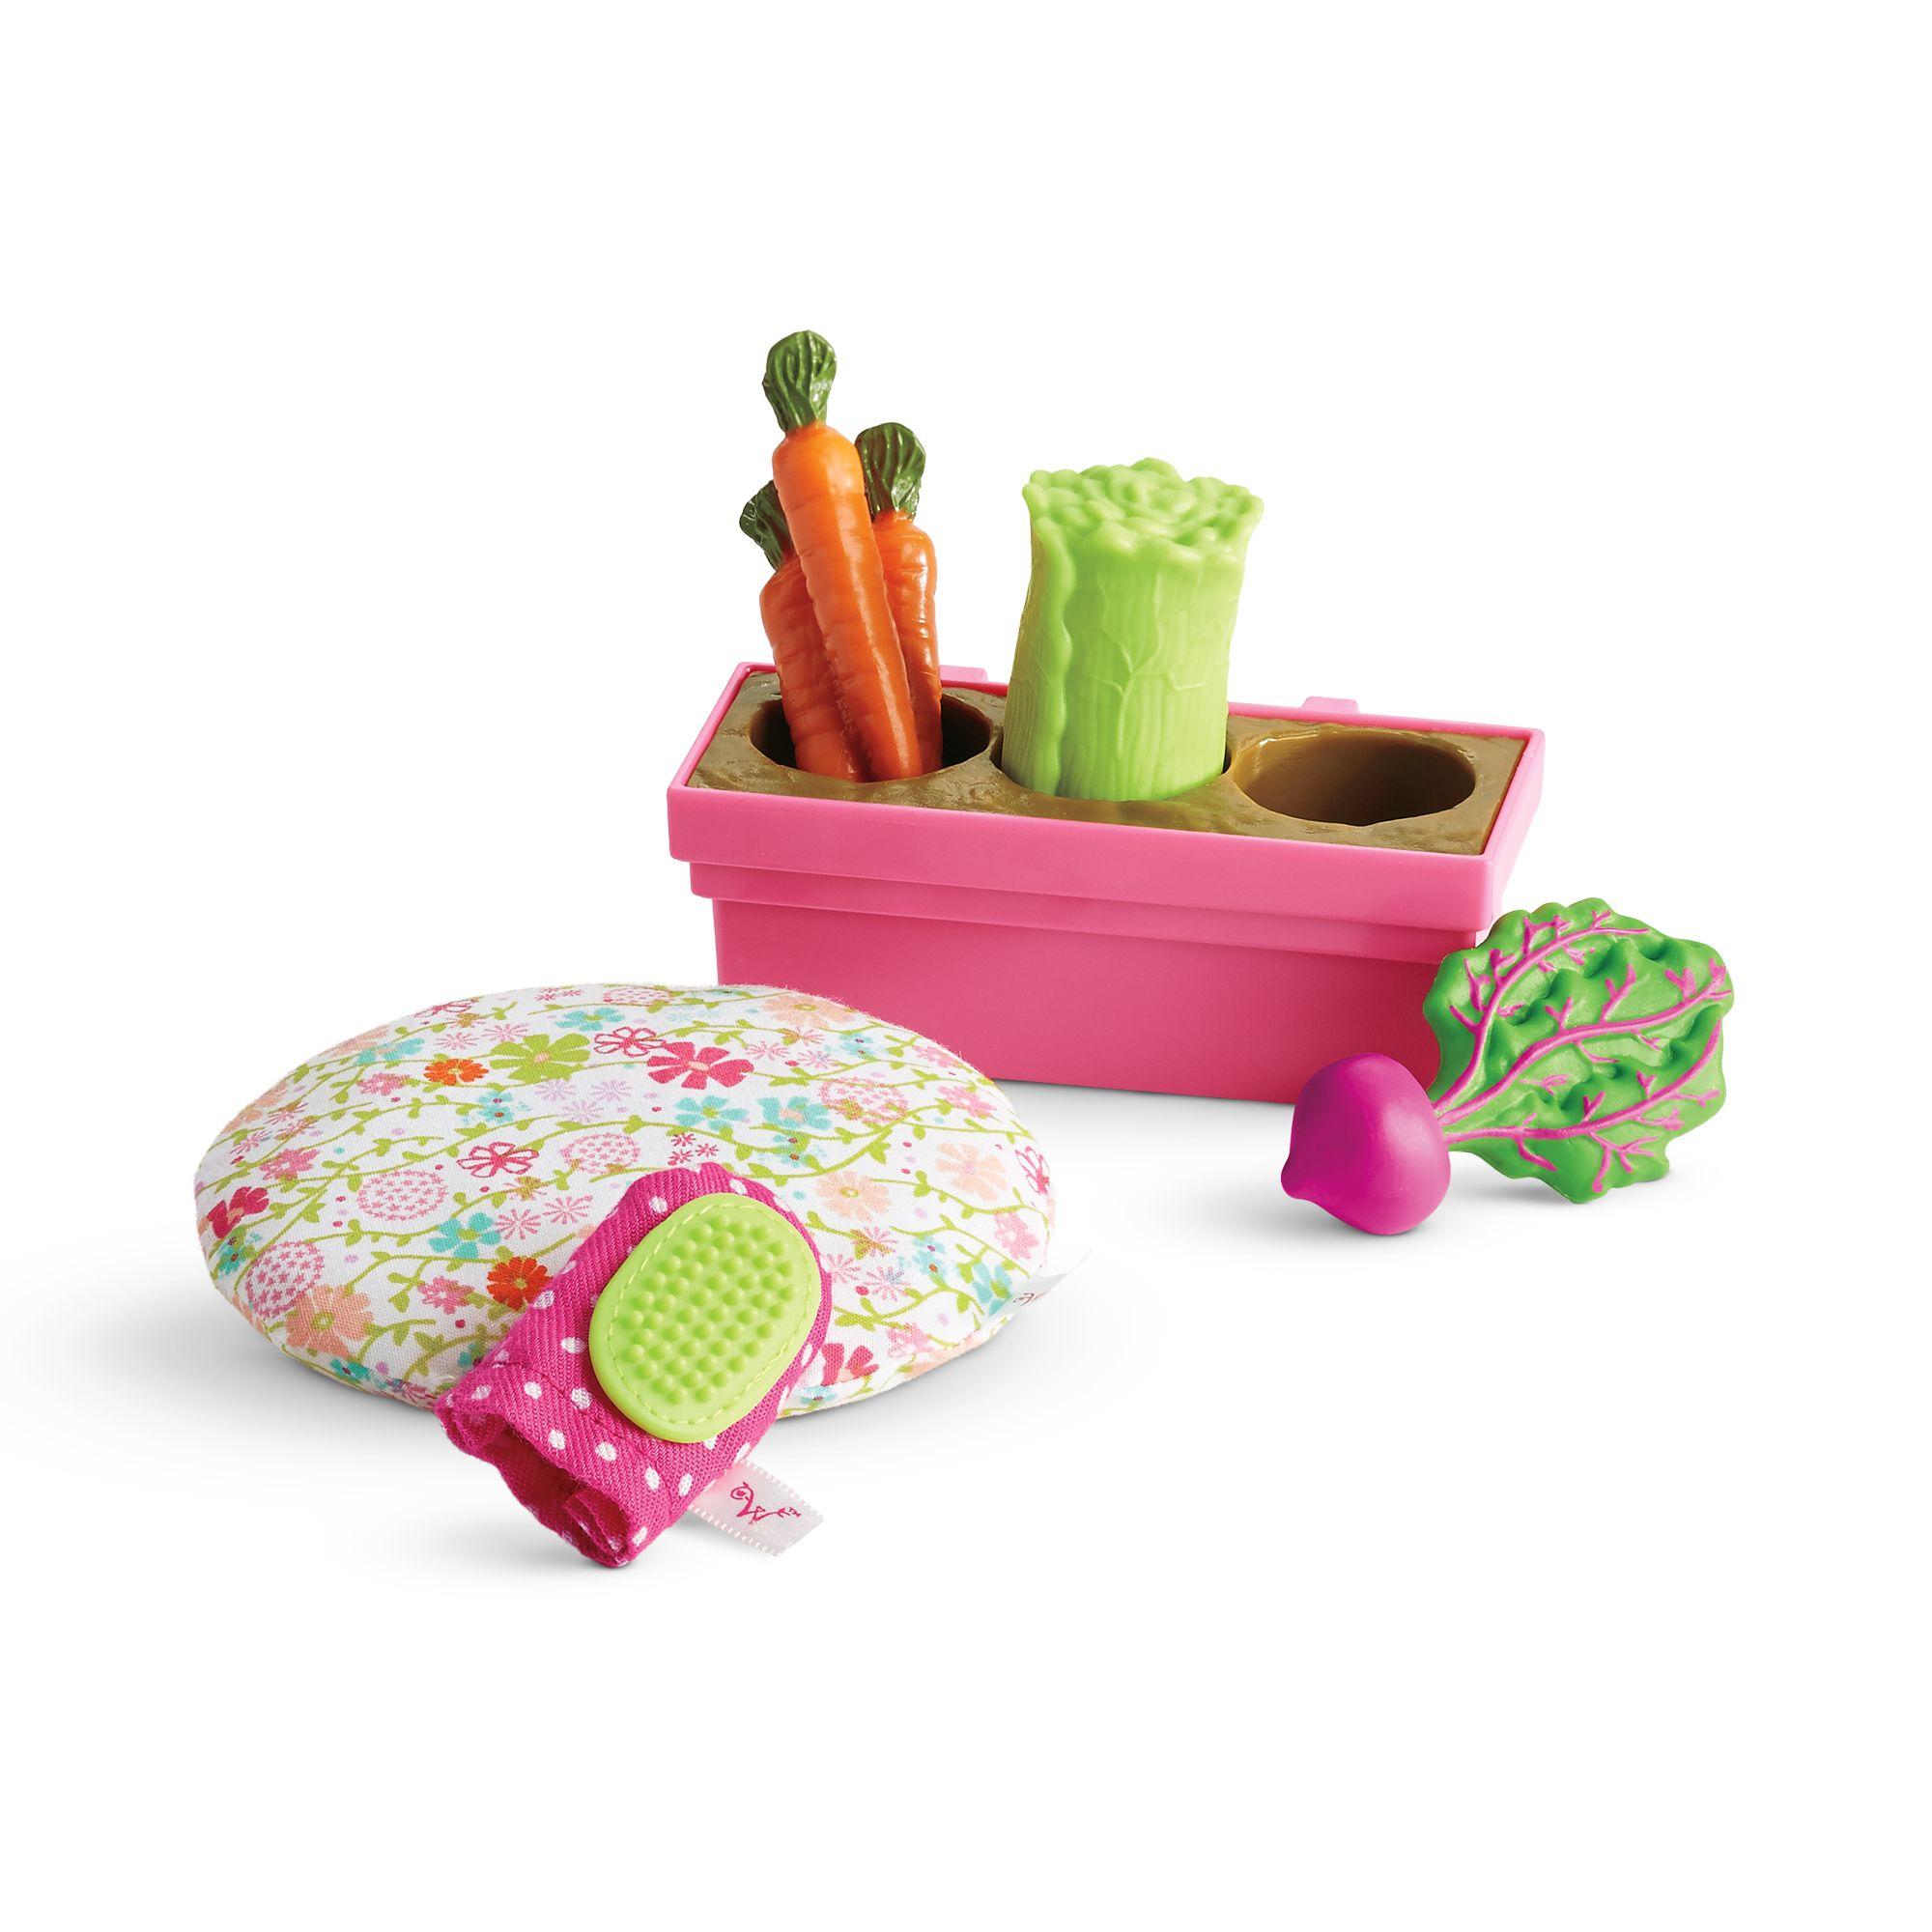 Carrot's Hutch Accessories